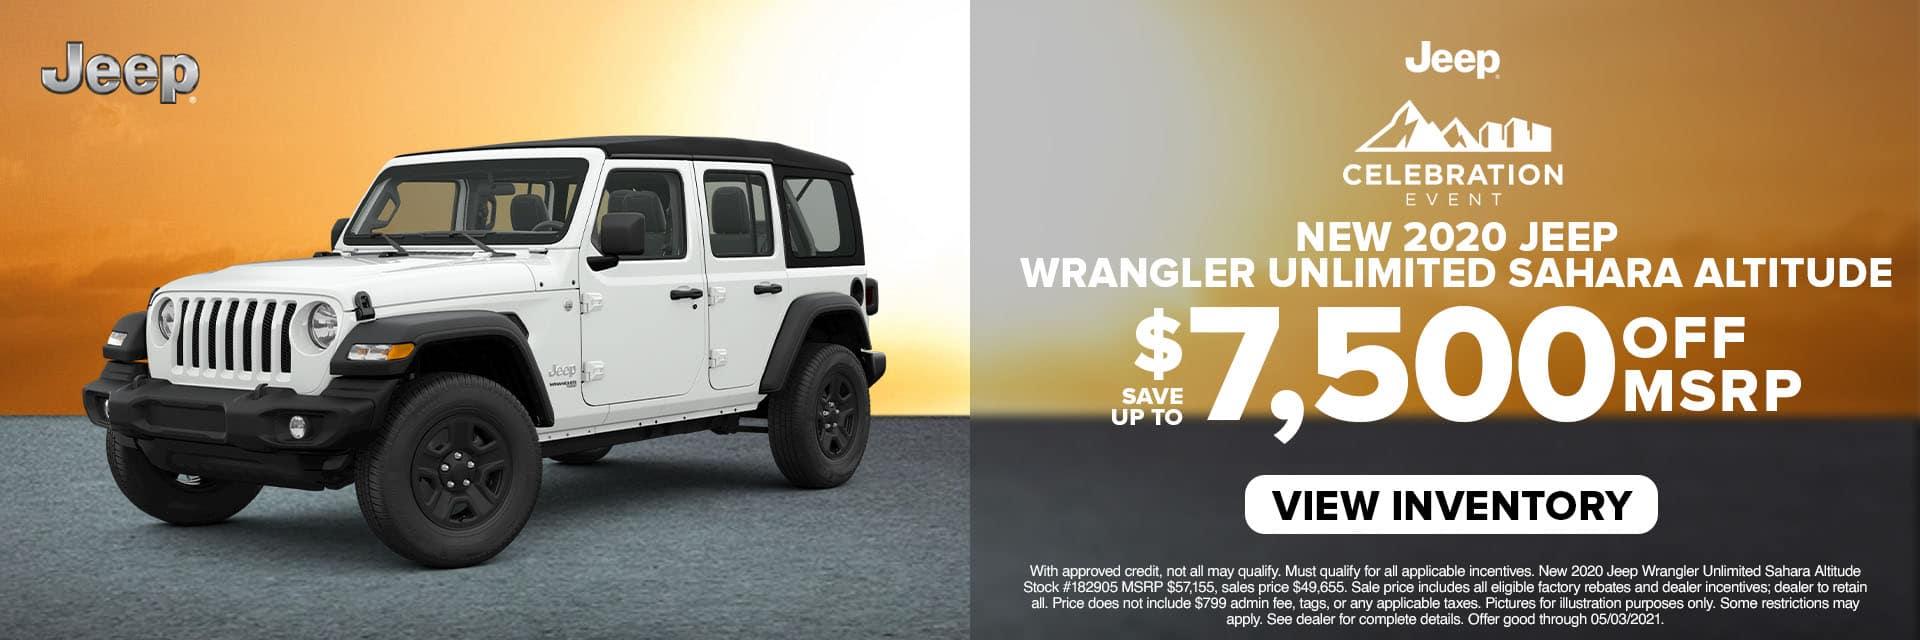 CLCP-April 2021-2021 Jeep Wrangler